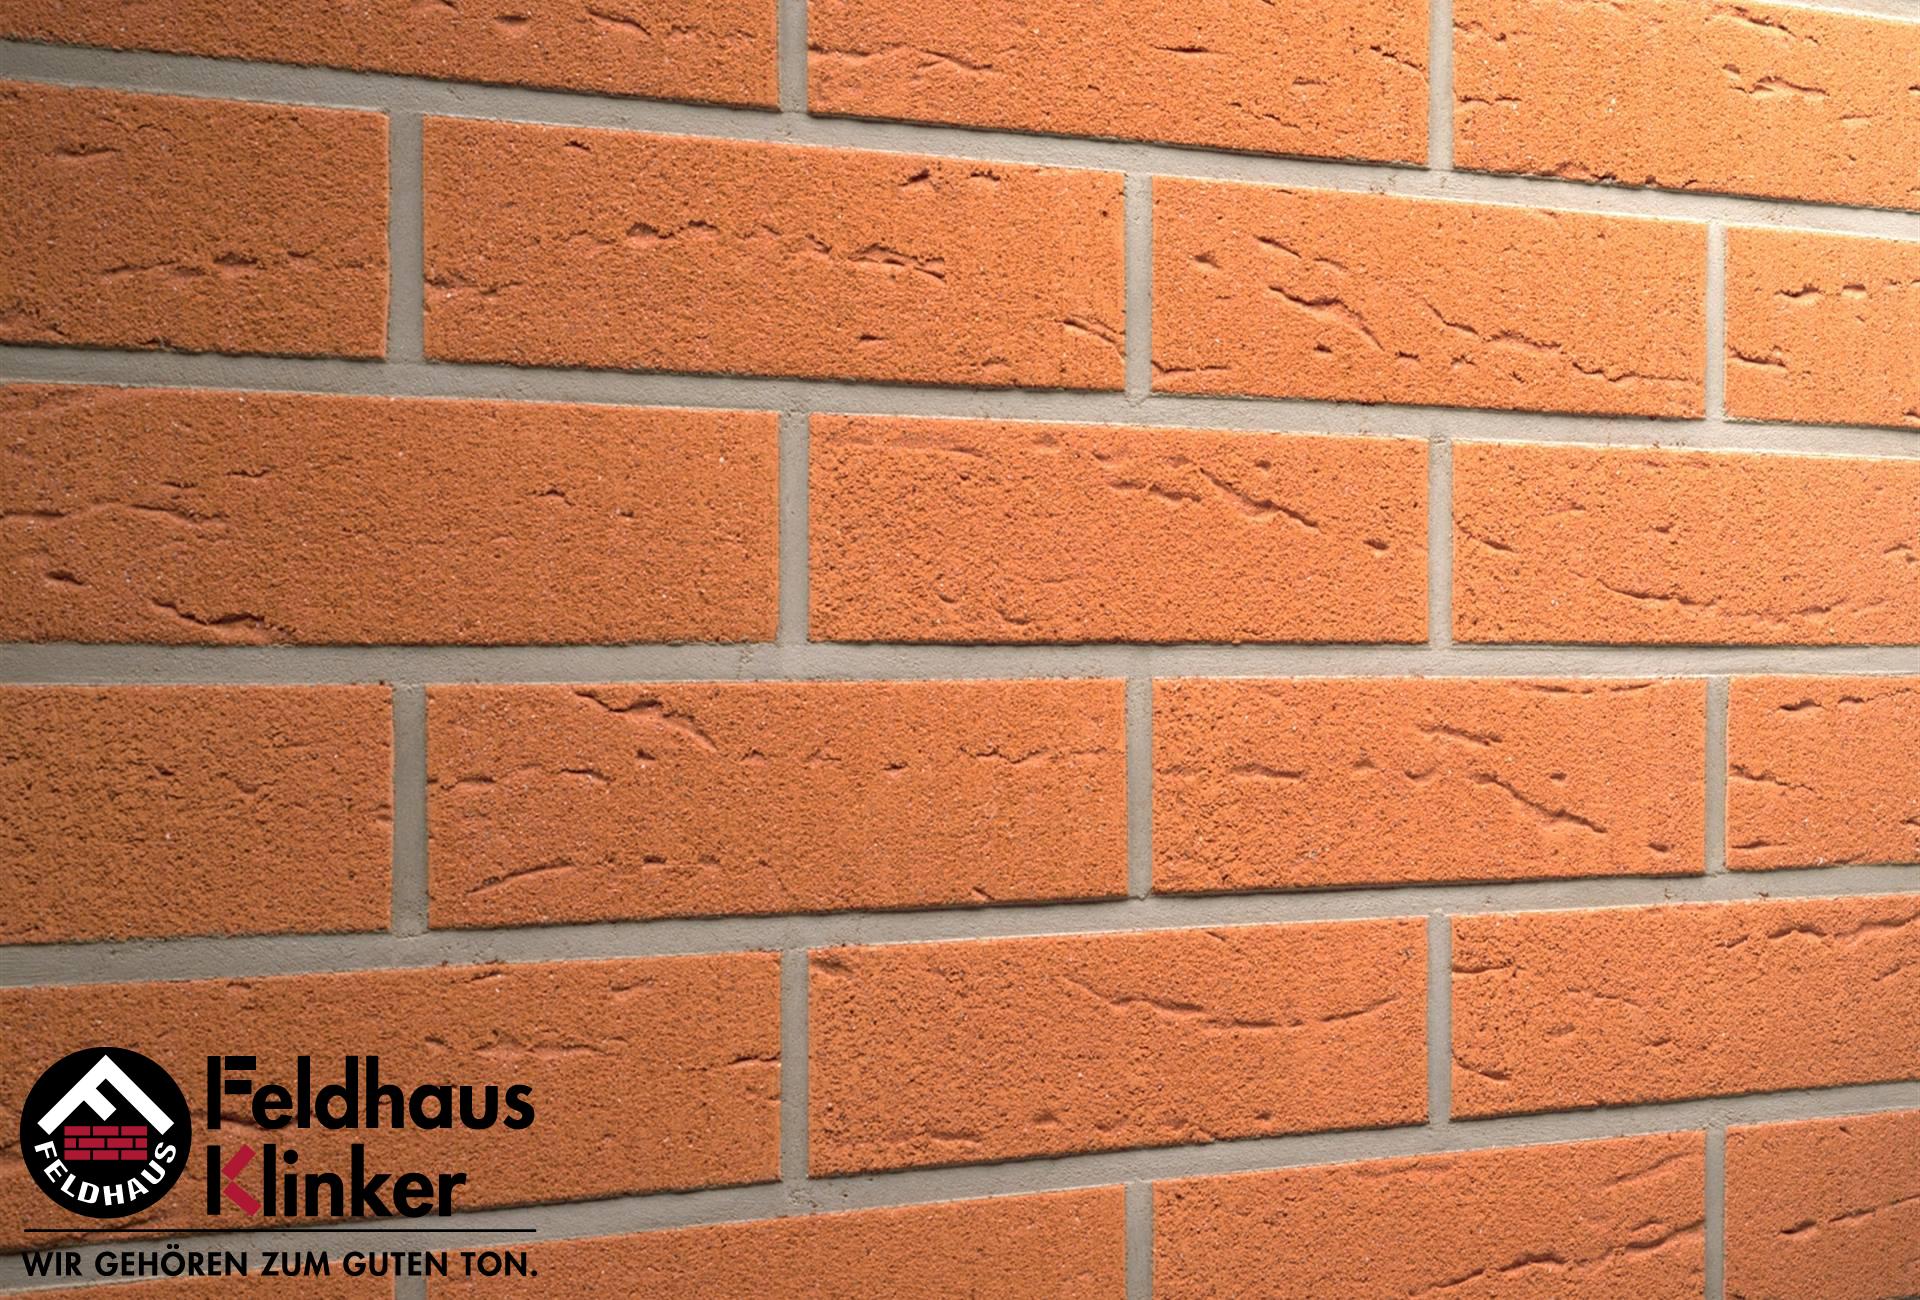 R227 Feldhaus Klinker клинкерная плитка 1